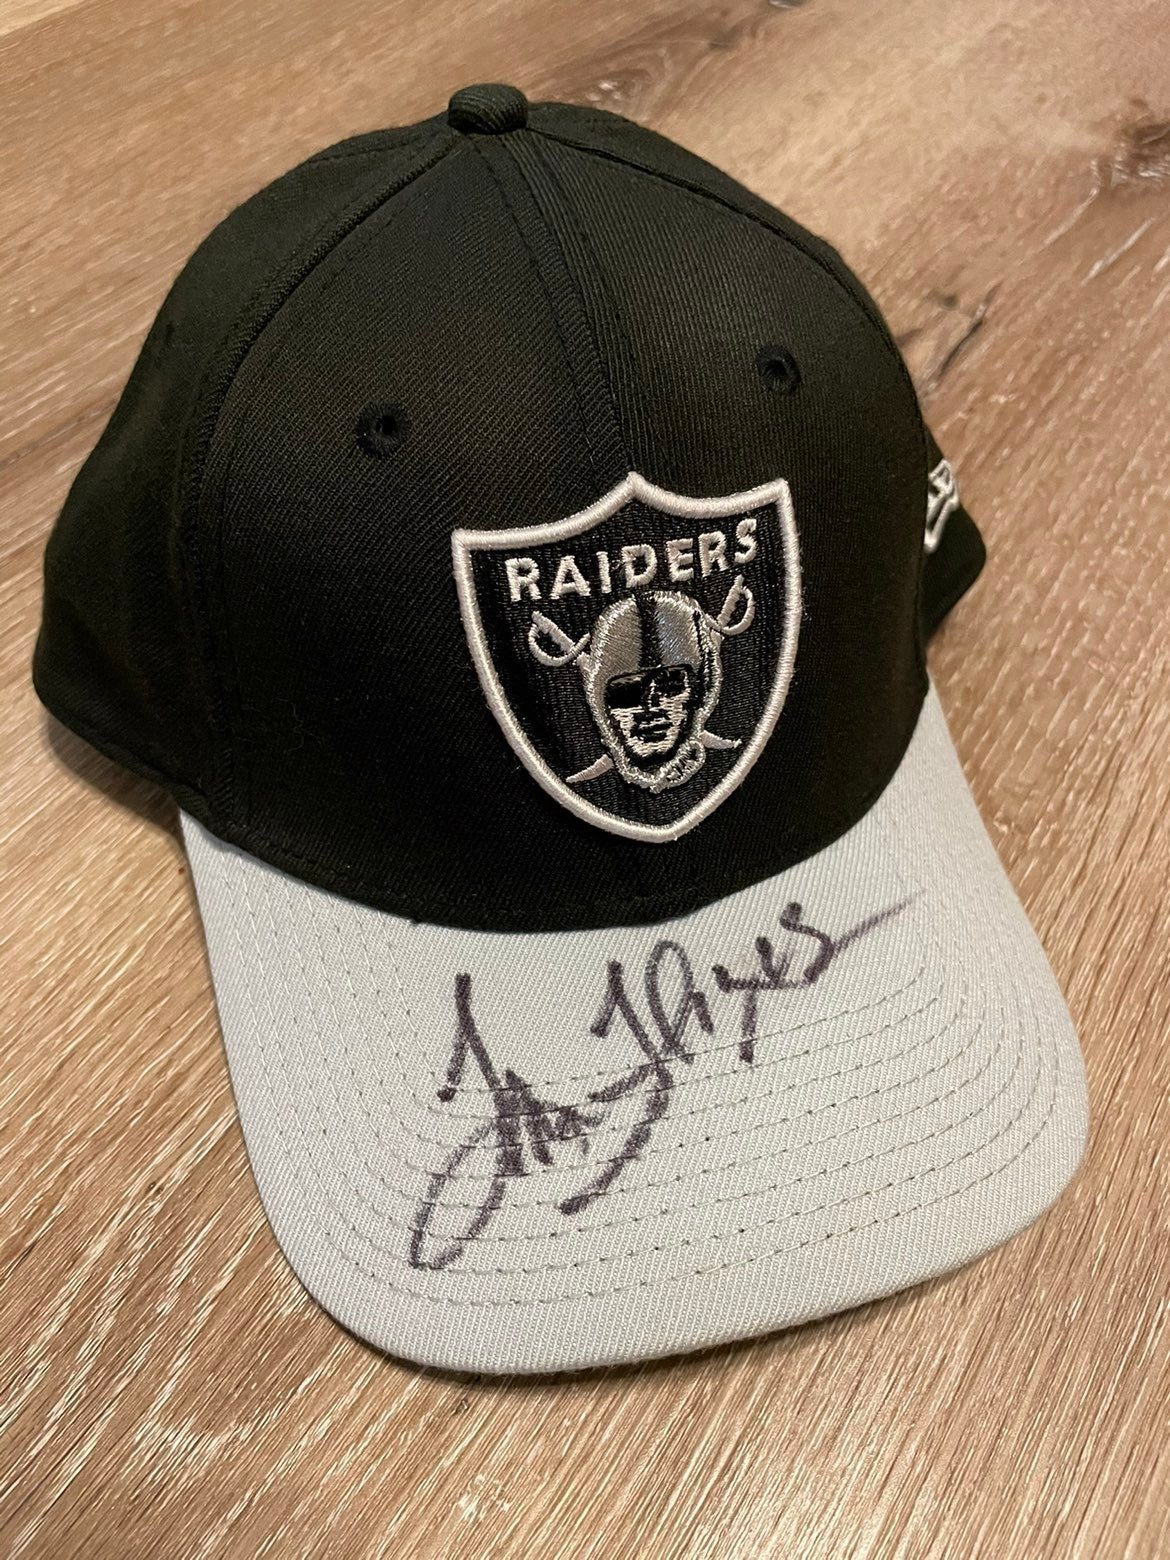 New Era Raiders Hat Signed also 8x10's